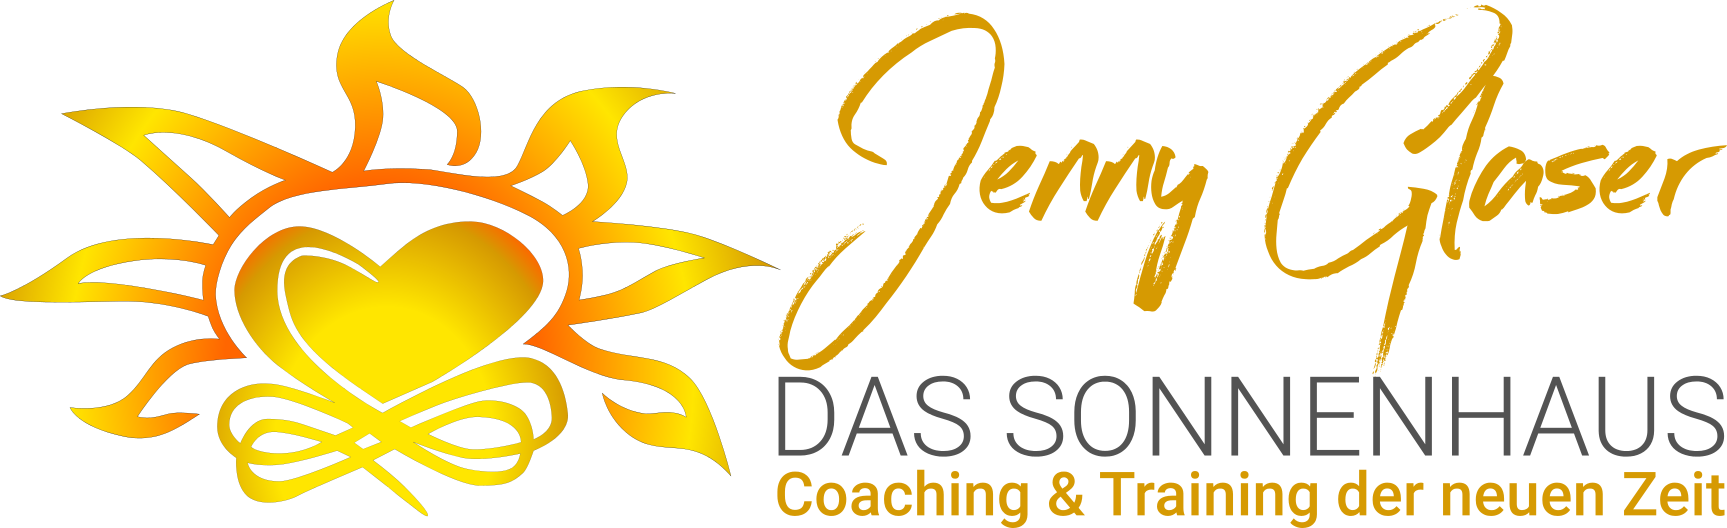 Member- Das Sonnenhaus